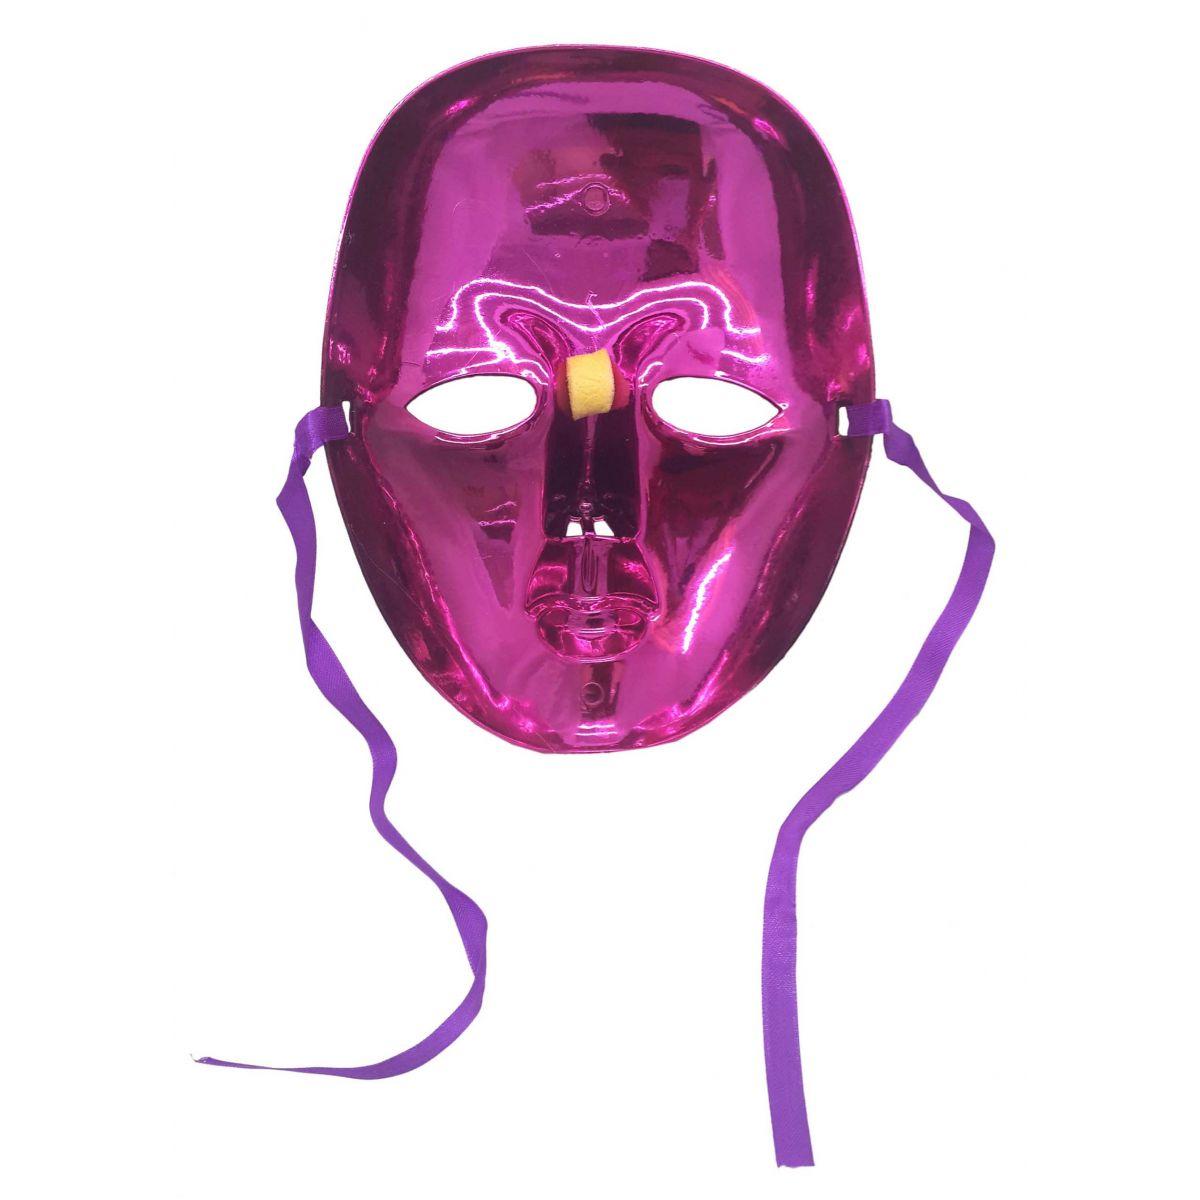 ... Conjunto 2 Mascaras Para Festa Baile Carnaval Halloween Fantasia  Metalizada Rosa (BL-0258- 79b0cb58156